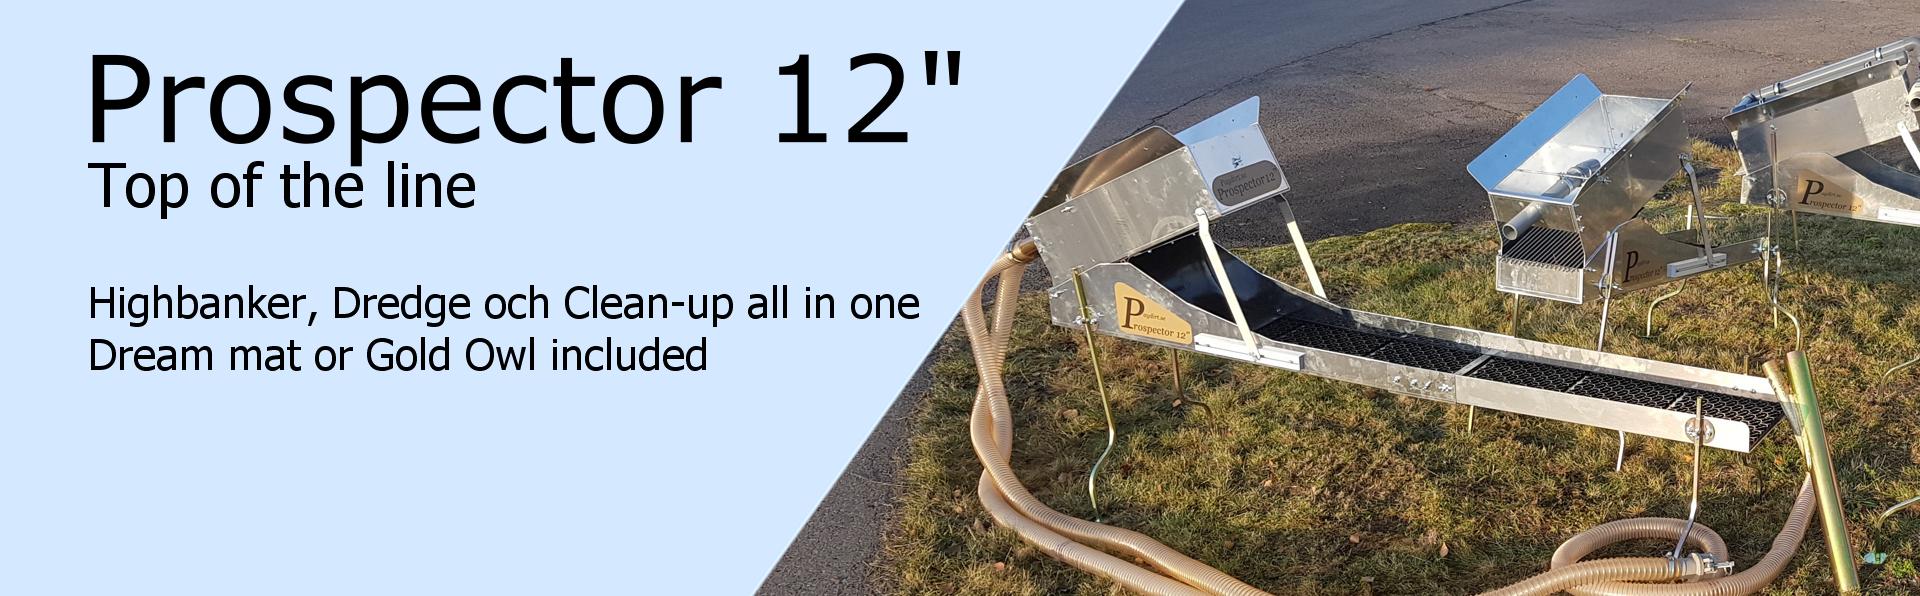 Prospector12